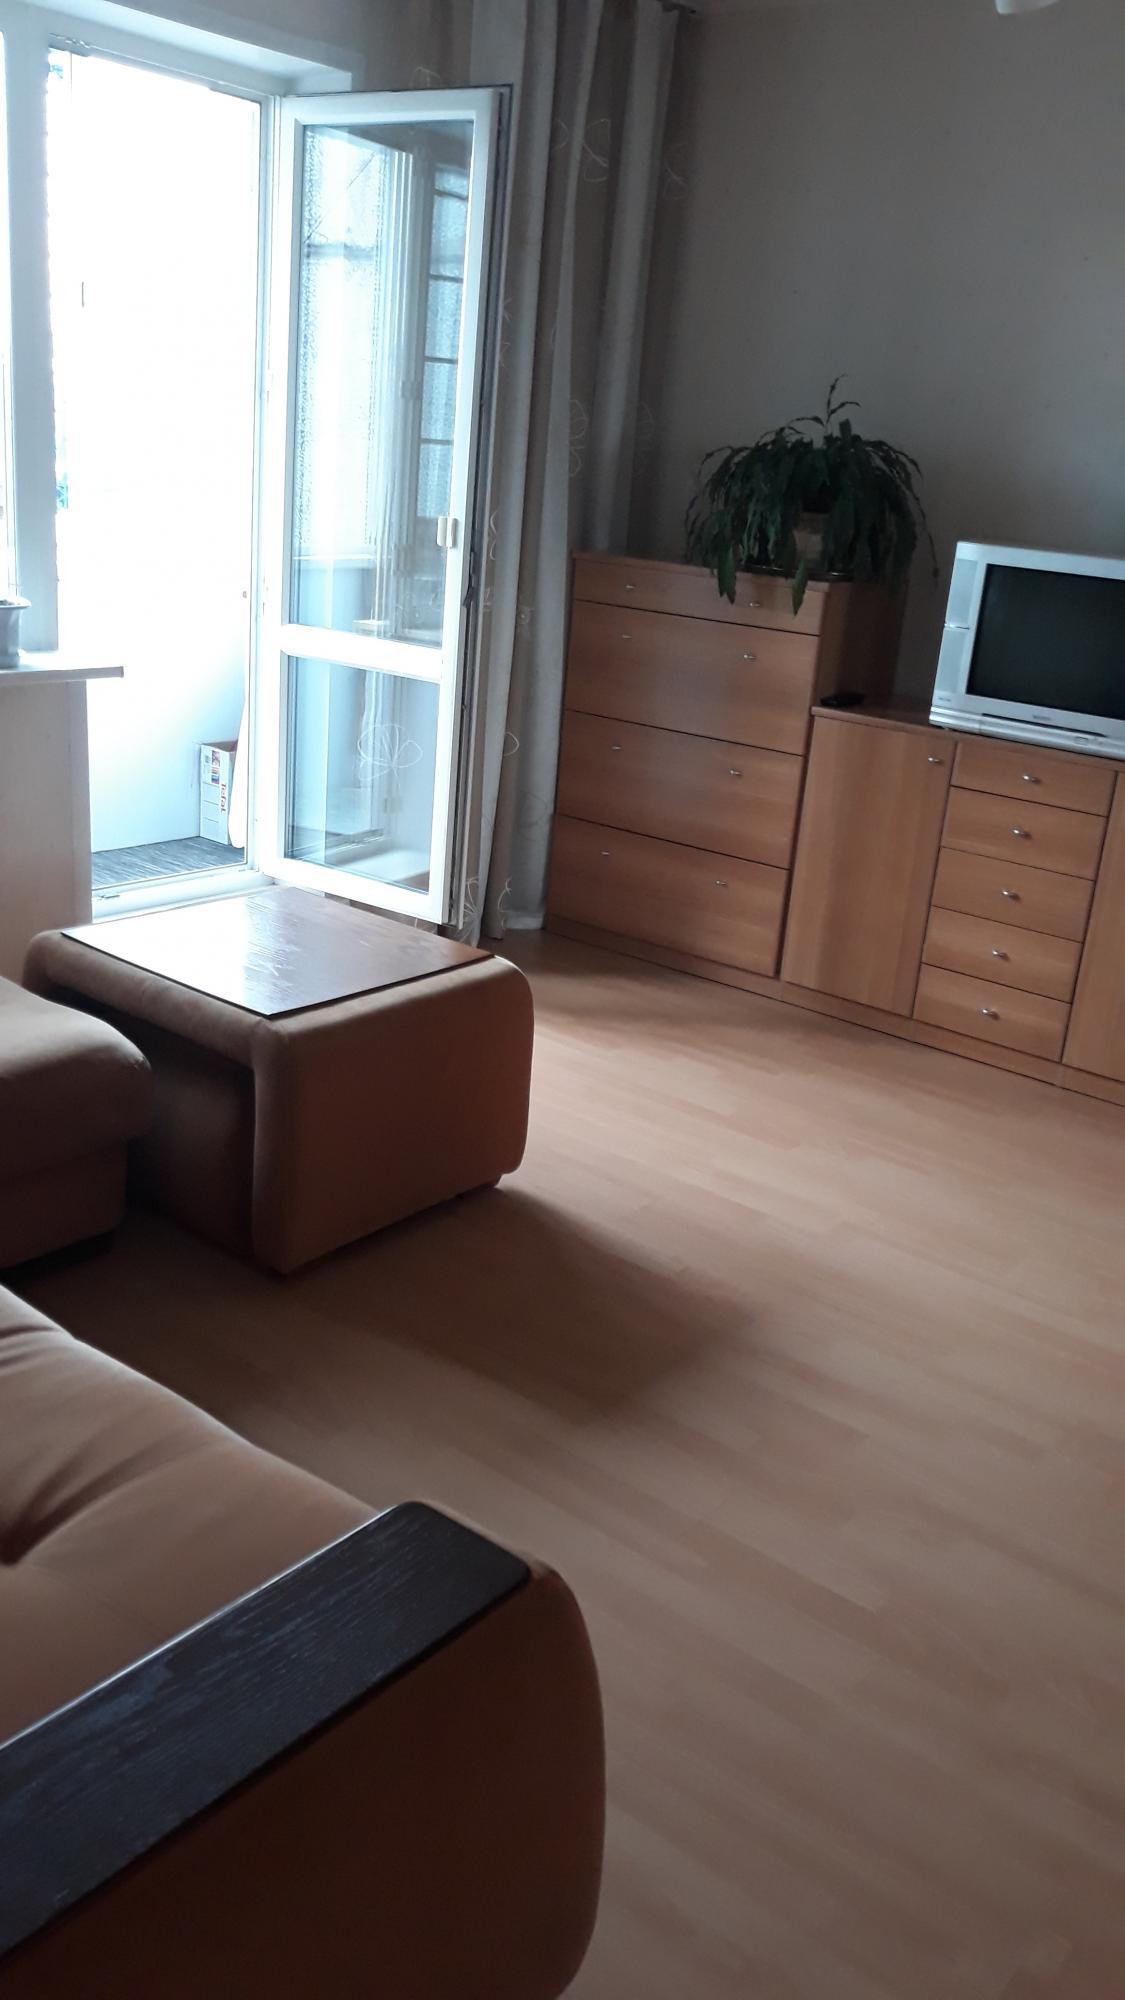 1к квартира улица Урицкого, 115 | 20000 | аренда в Красноярске фото 2